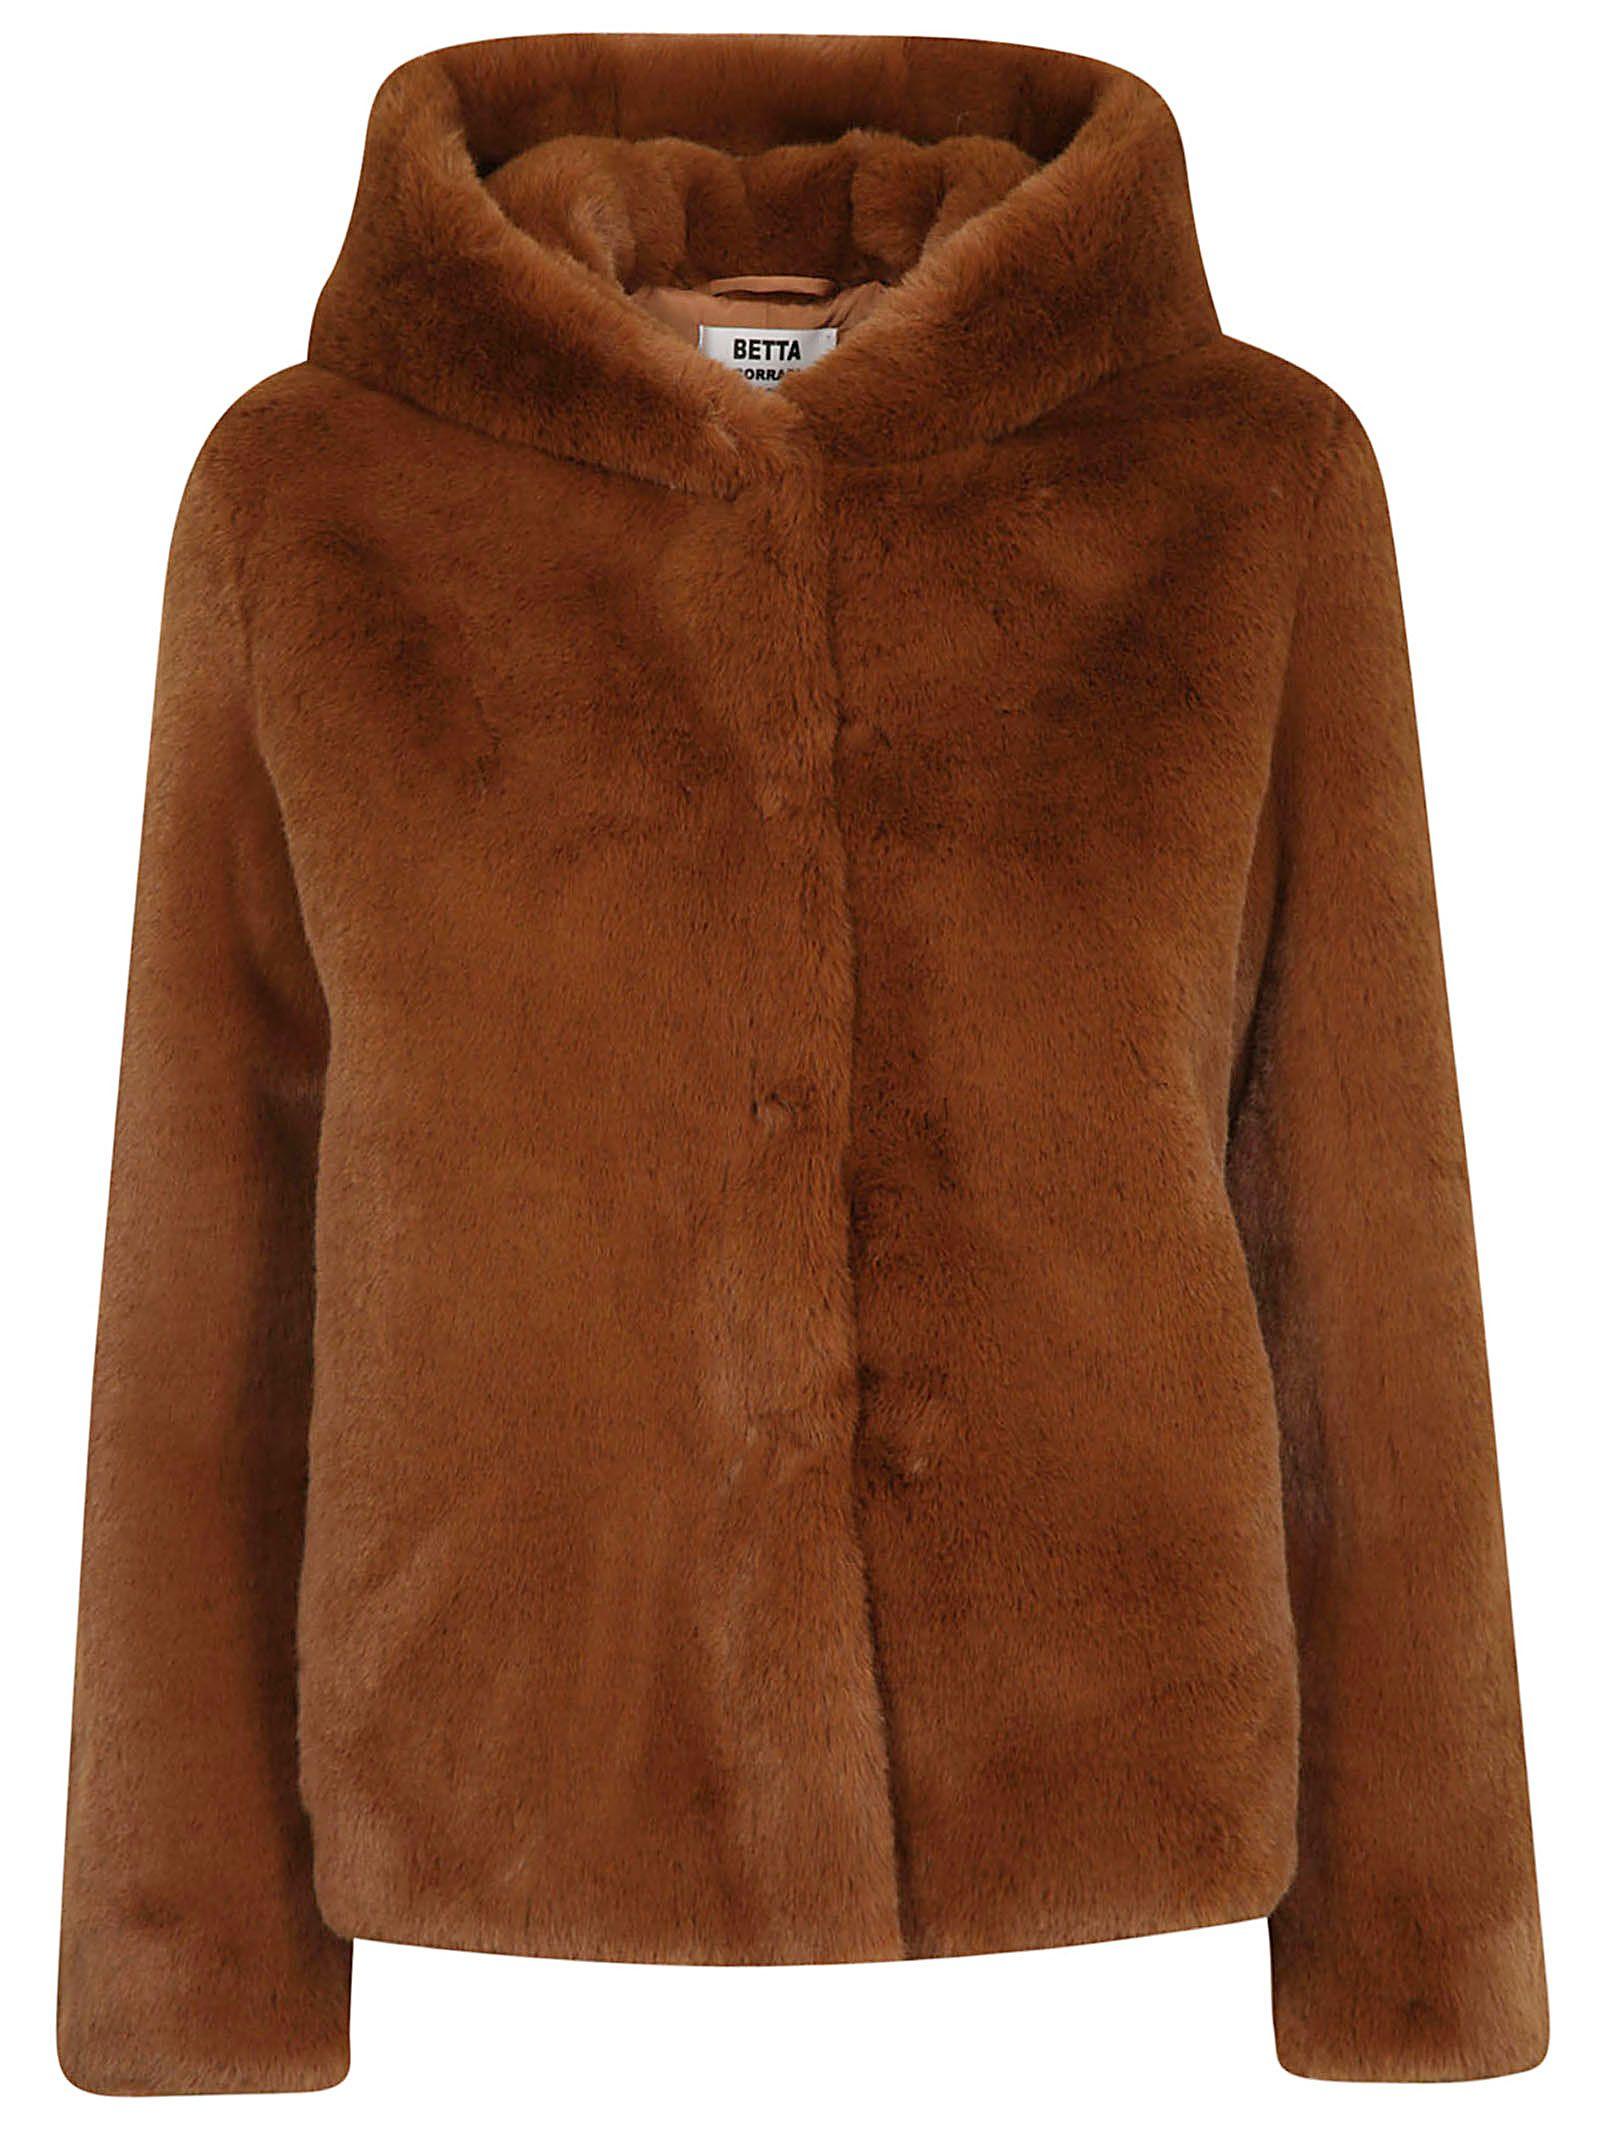 BETTA CORRADI Fur Hooded Jacket in Cammello